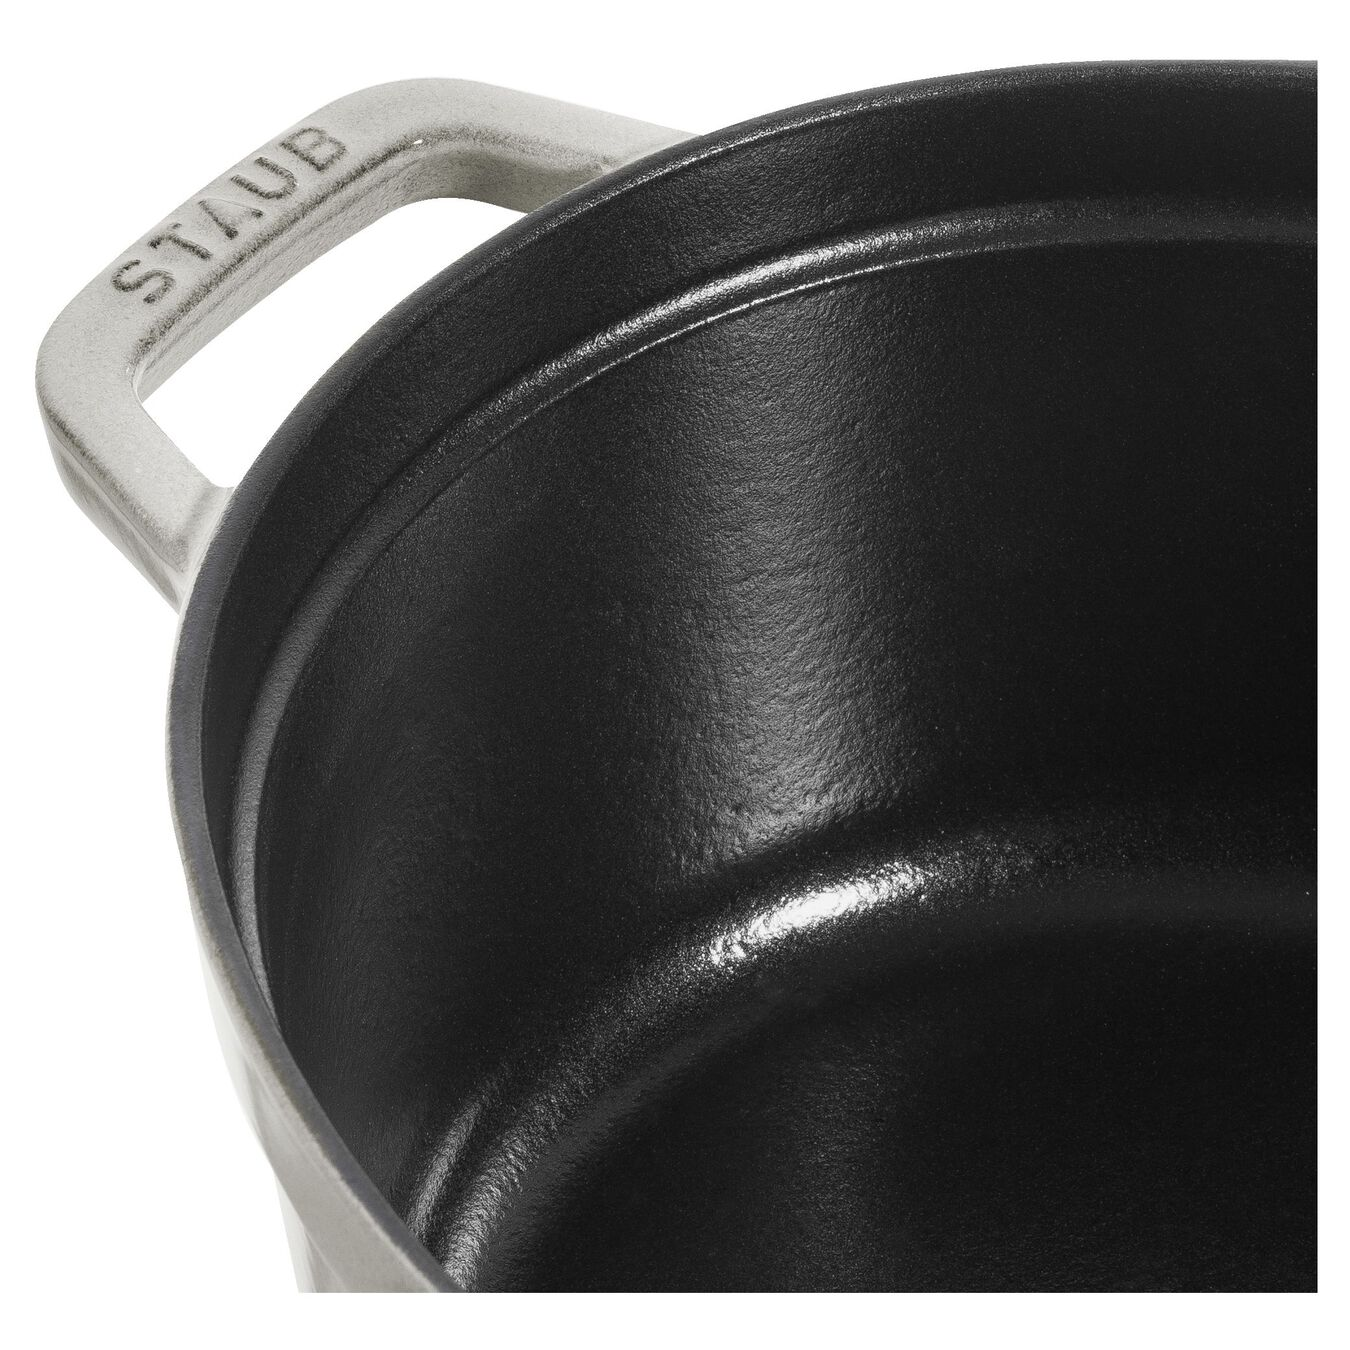 3,25 l Cast iron oval Faitout, White Truffle,,large 2